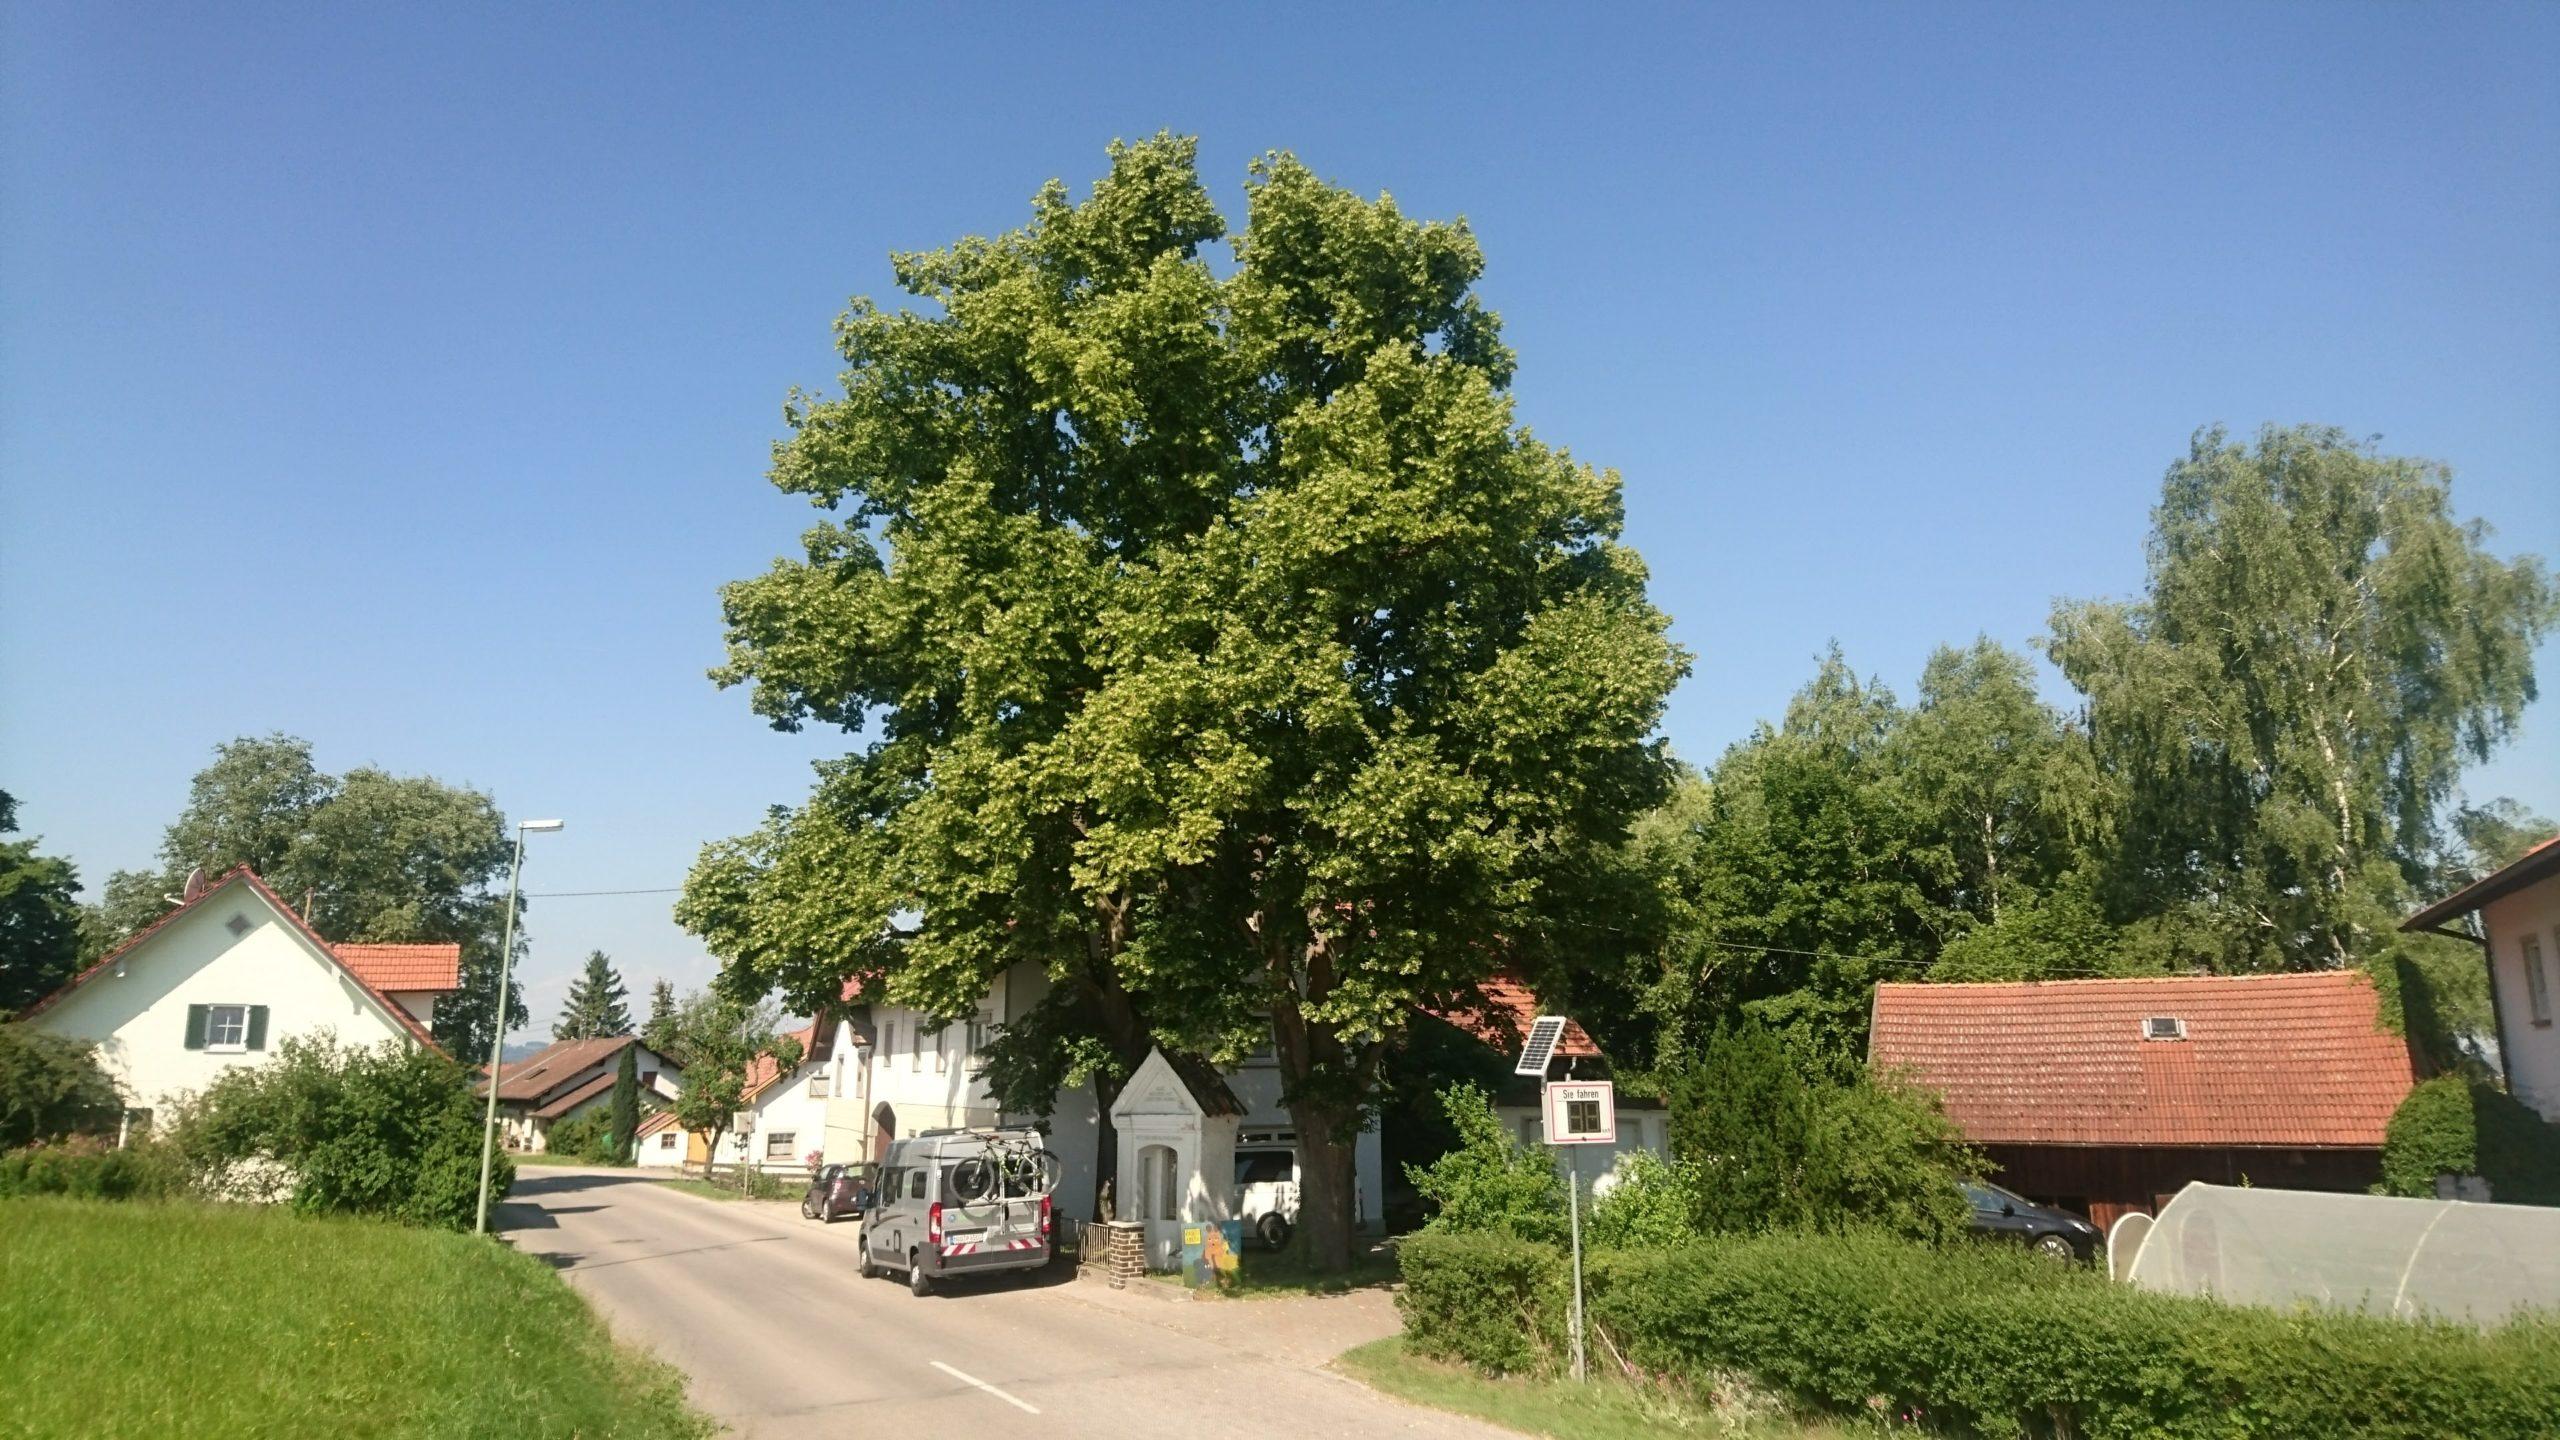 Baumuntersuchungen mit Gutachten an Naturdenkmalen